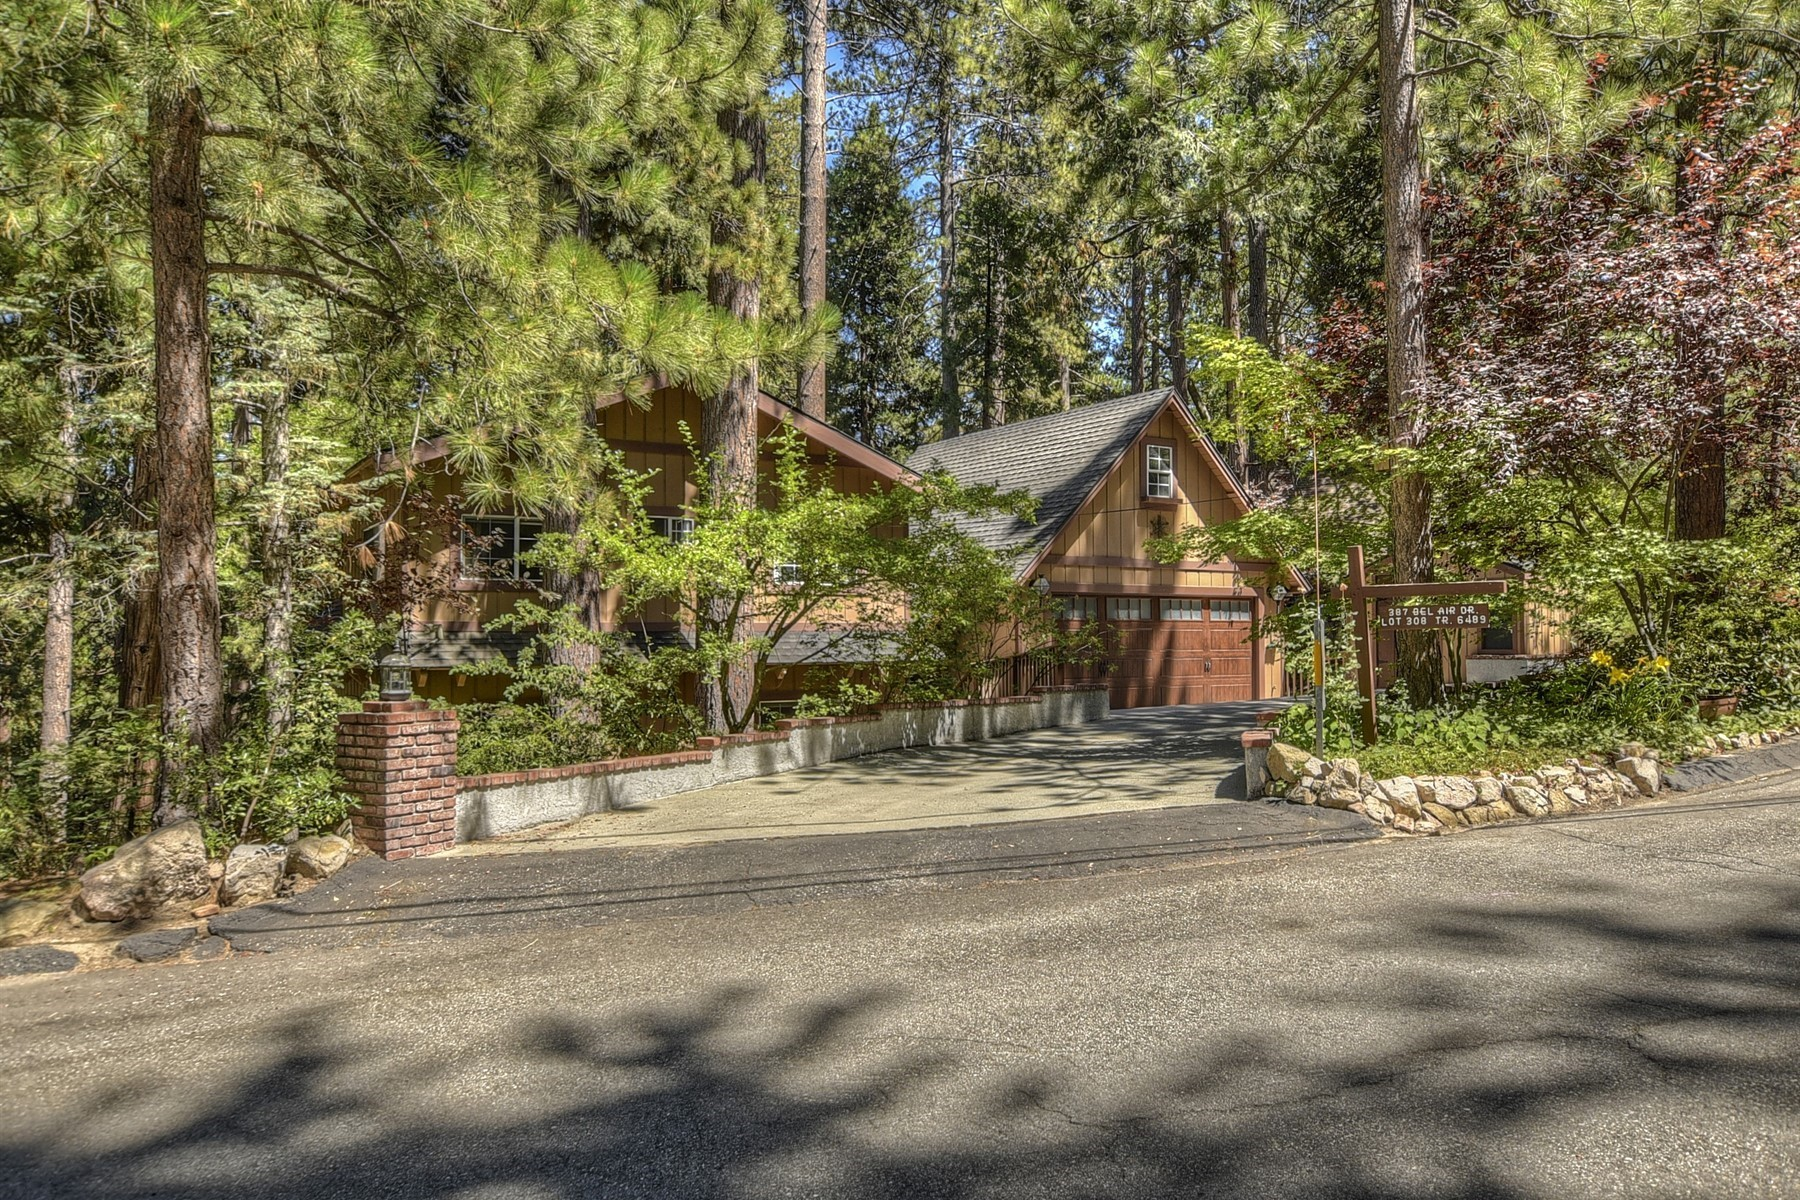 Single Family Homes for Sale at Lake Arrowhead 387 Bel Air Drive Lake Arrowhead, California 92352 United States